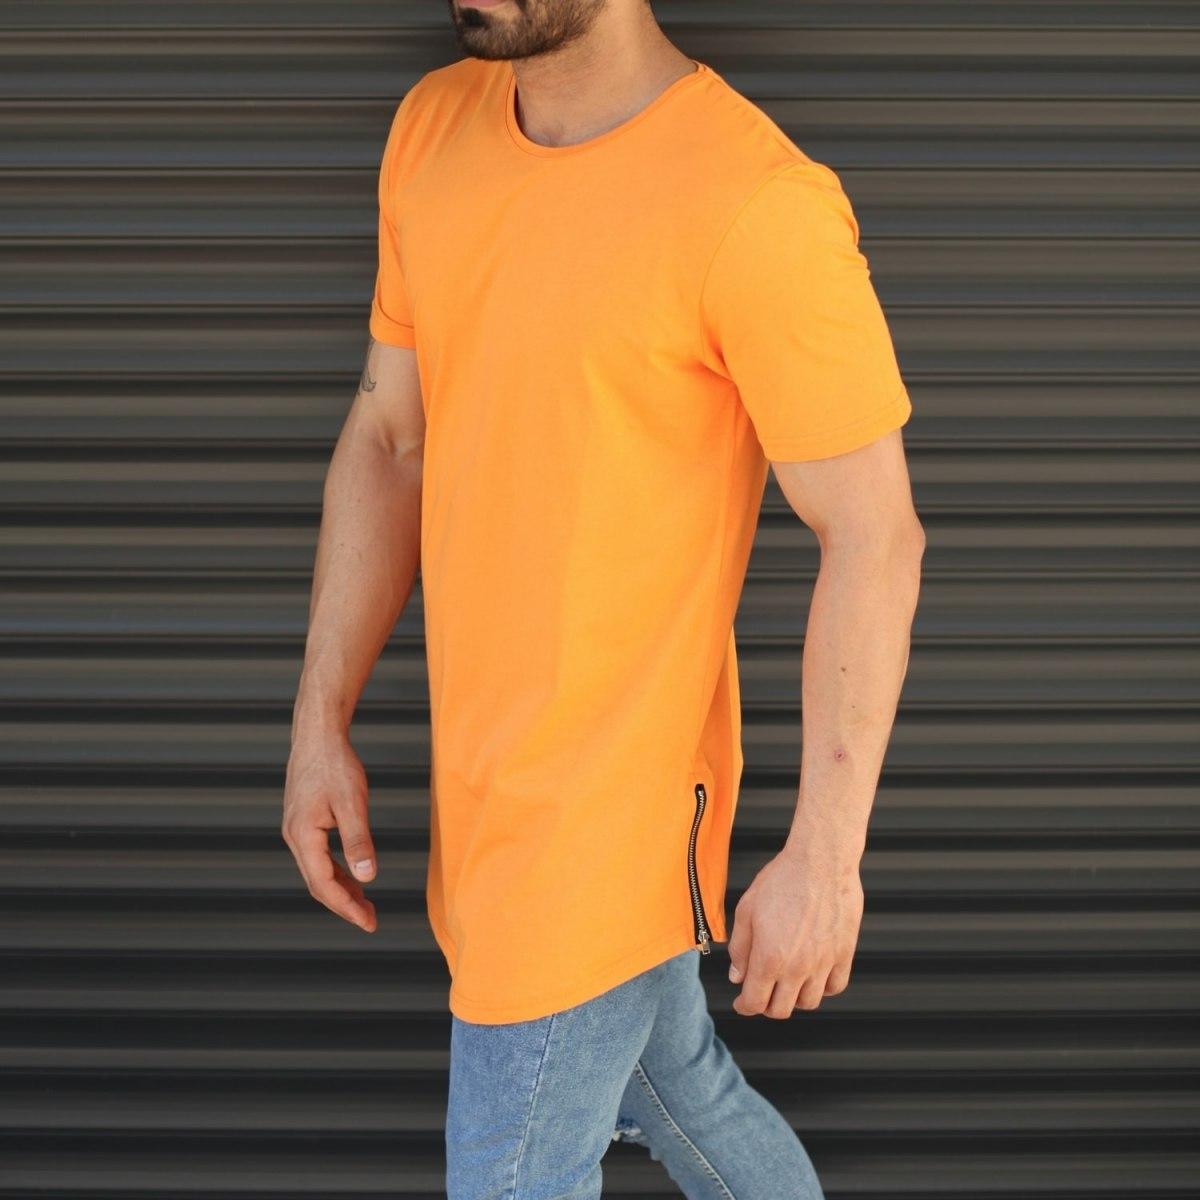 Men's Longline Round Neck T-Shirt In Orange Mv Premium Brand - 2